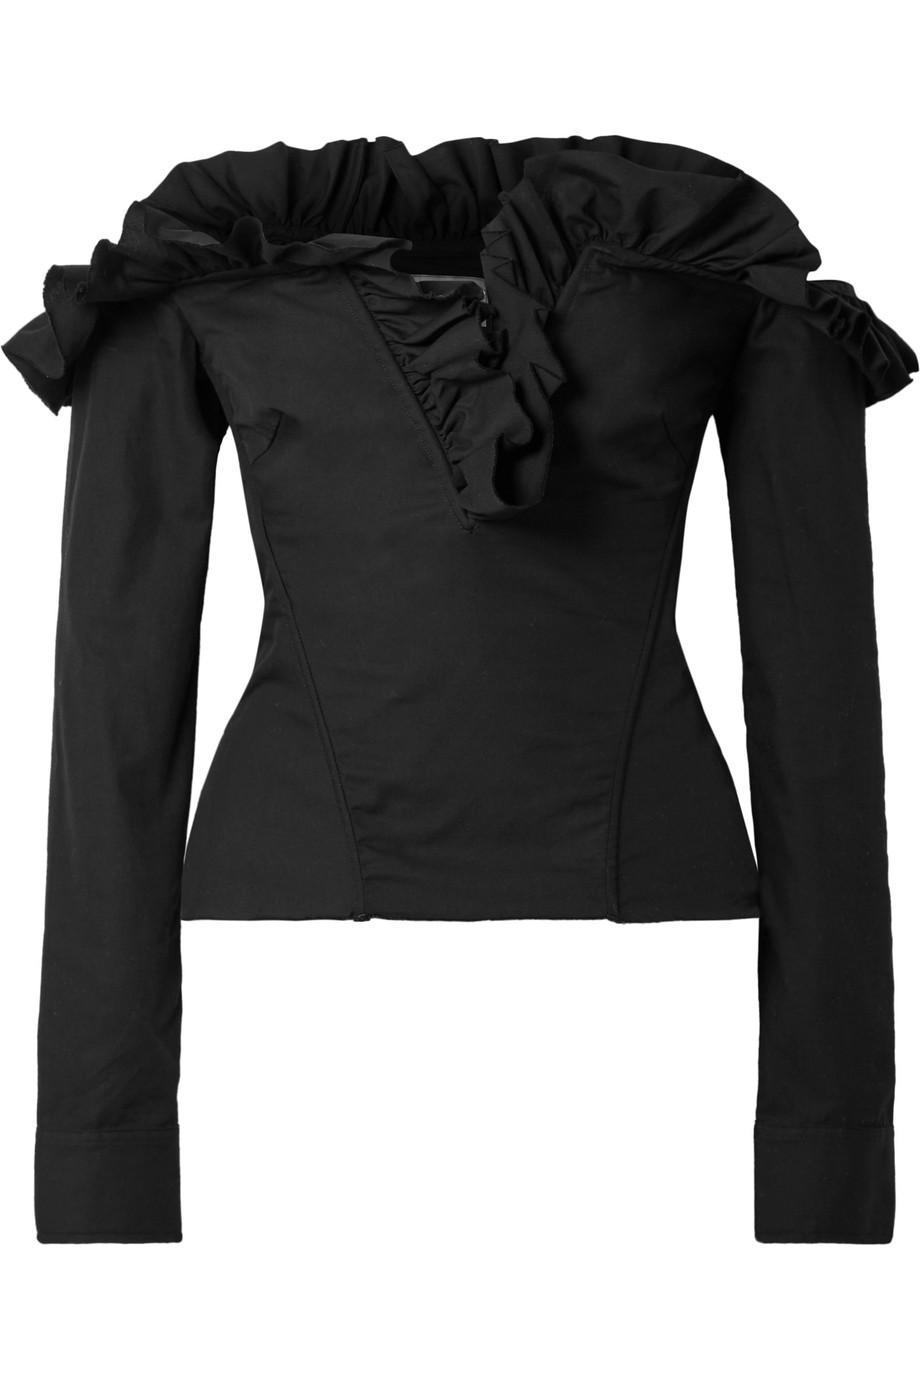 Off-the-shoulder Ruffled Lace-up Cotton-poplin Top - Black Marques Almeida Clearance Visit UzDMqZRX